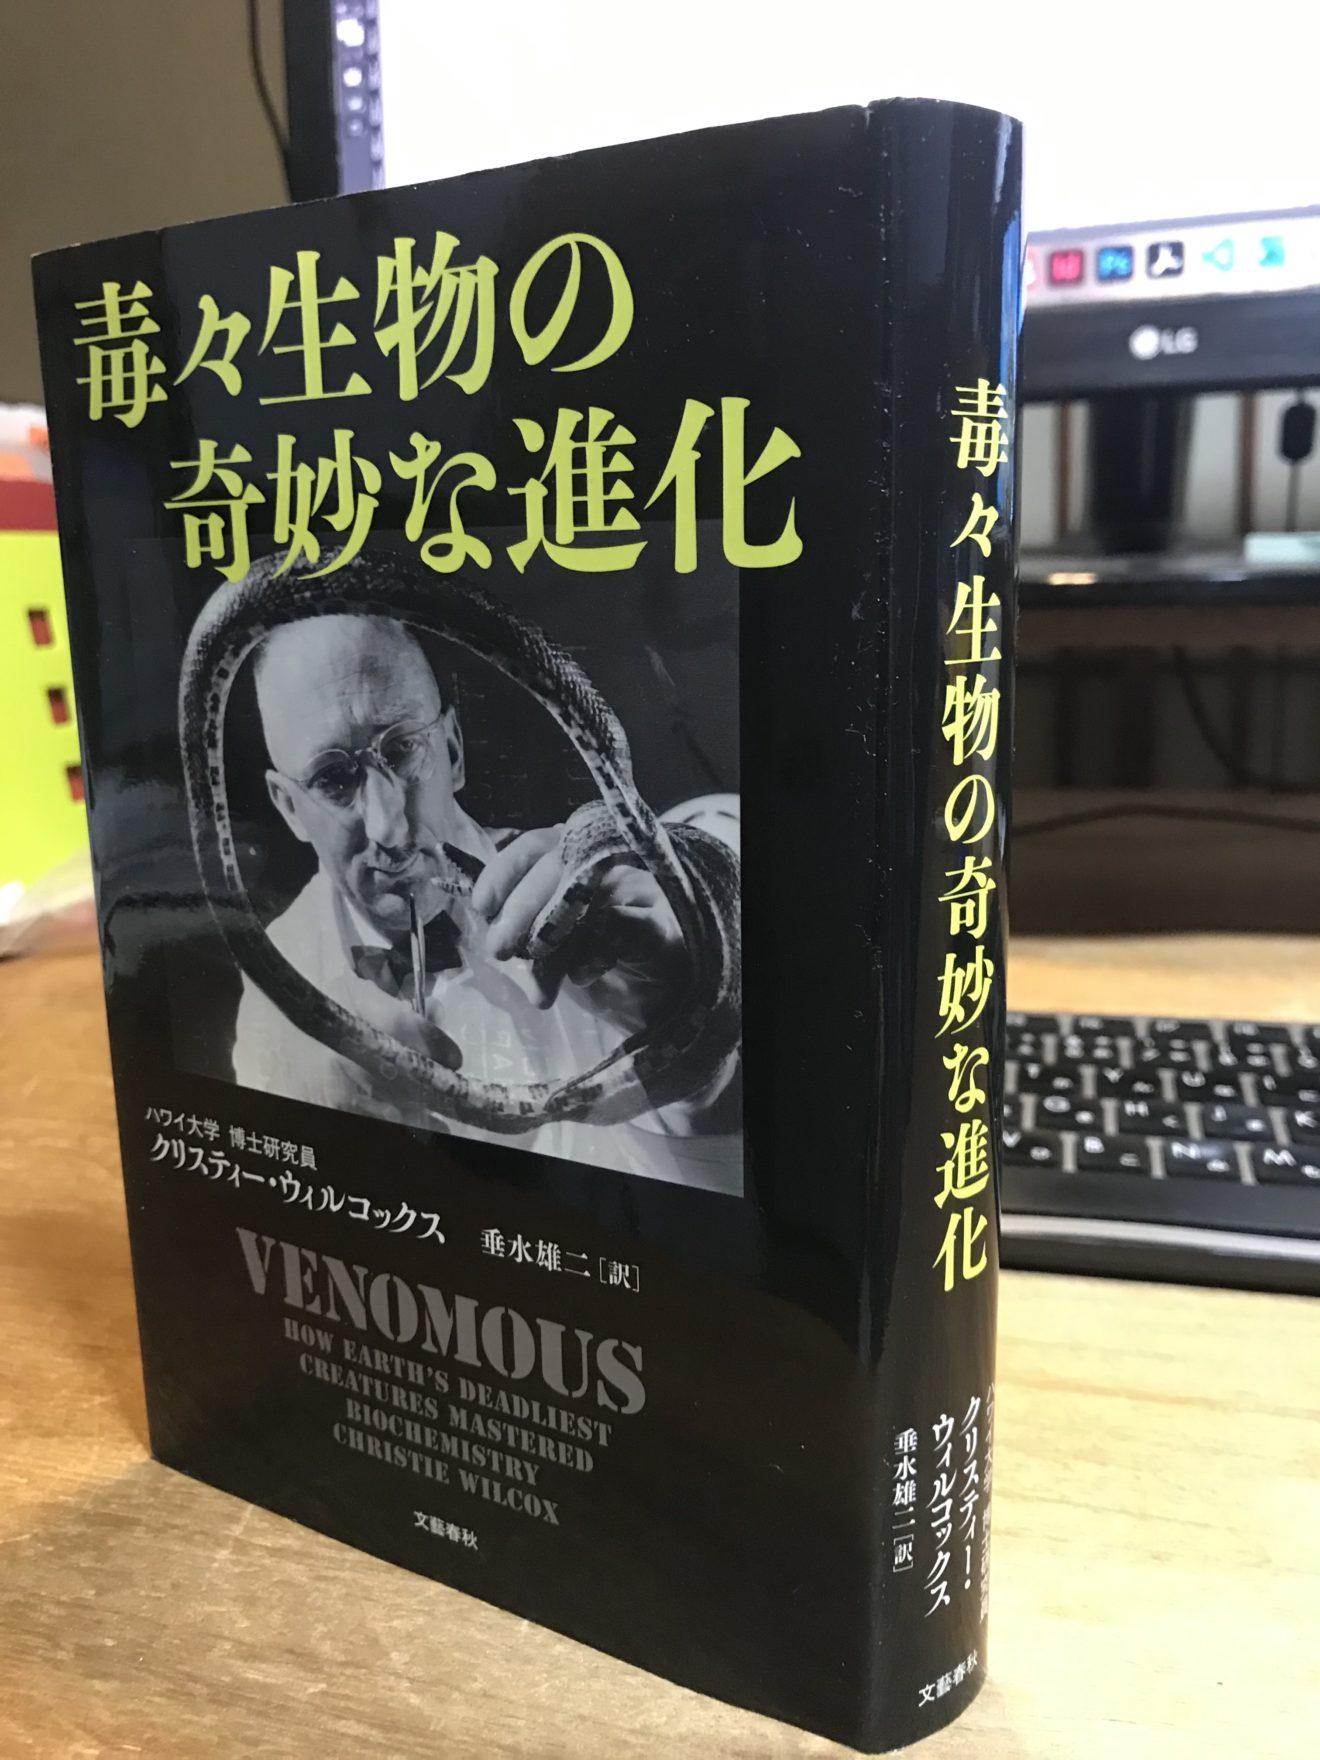 venomous_cover